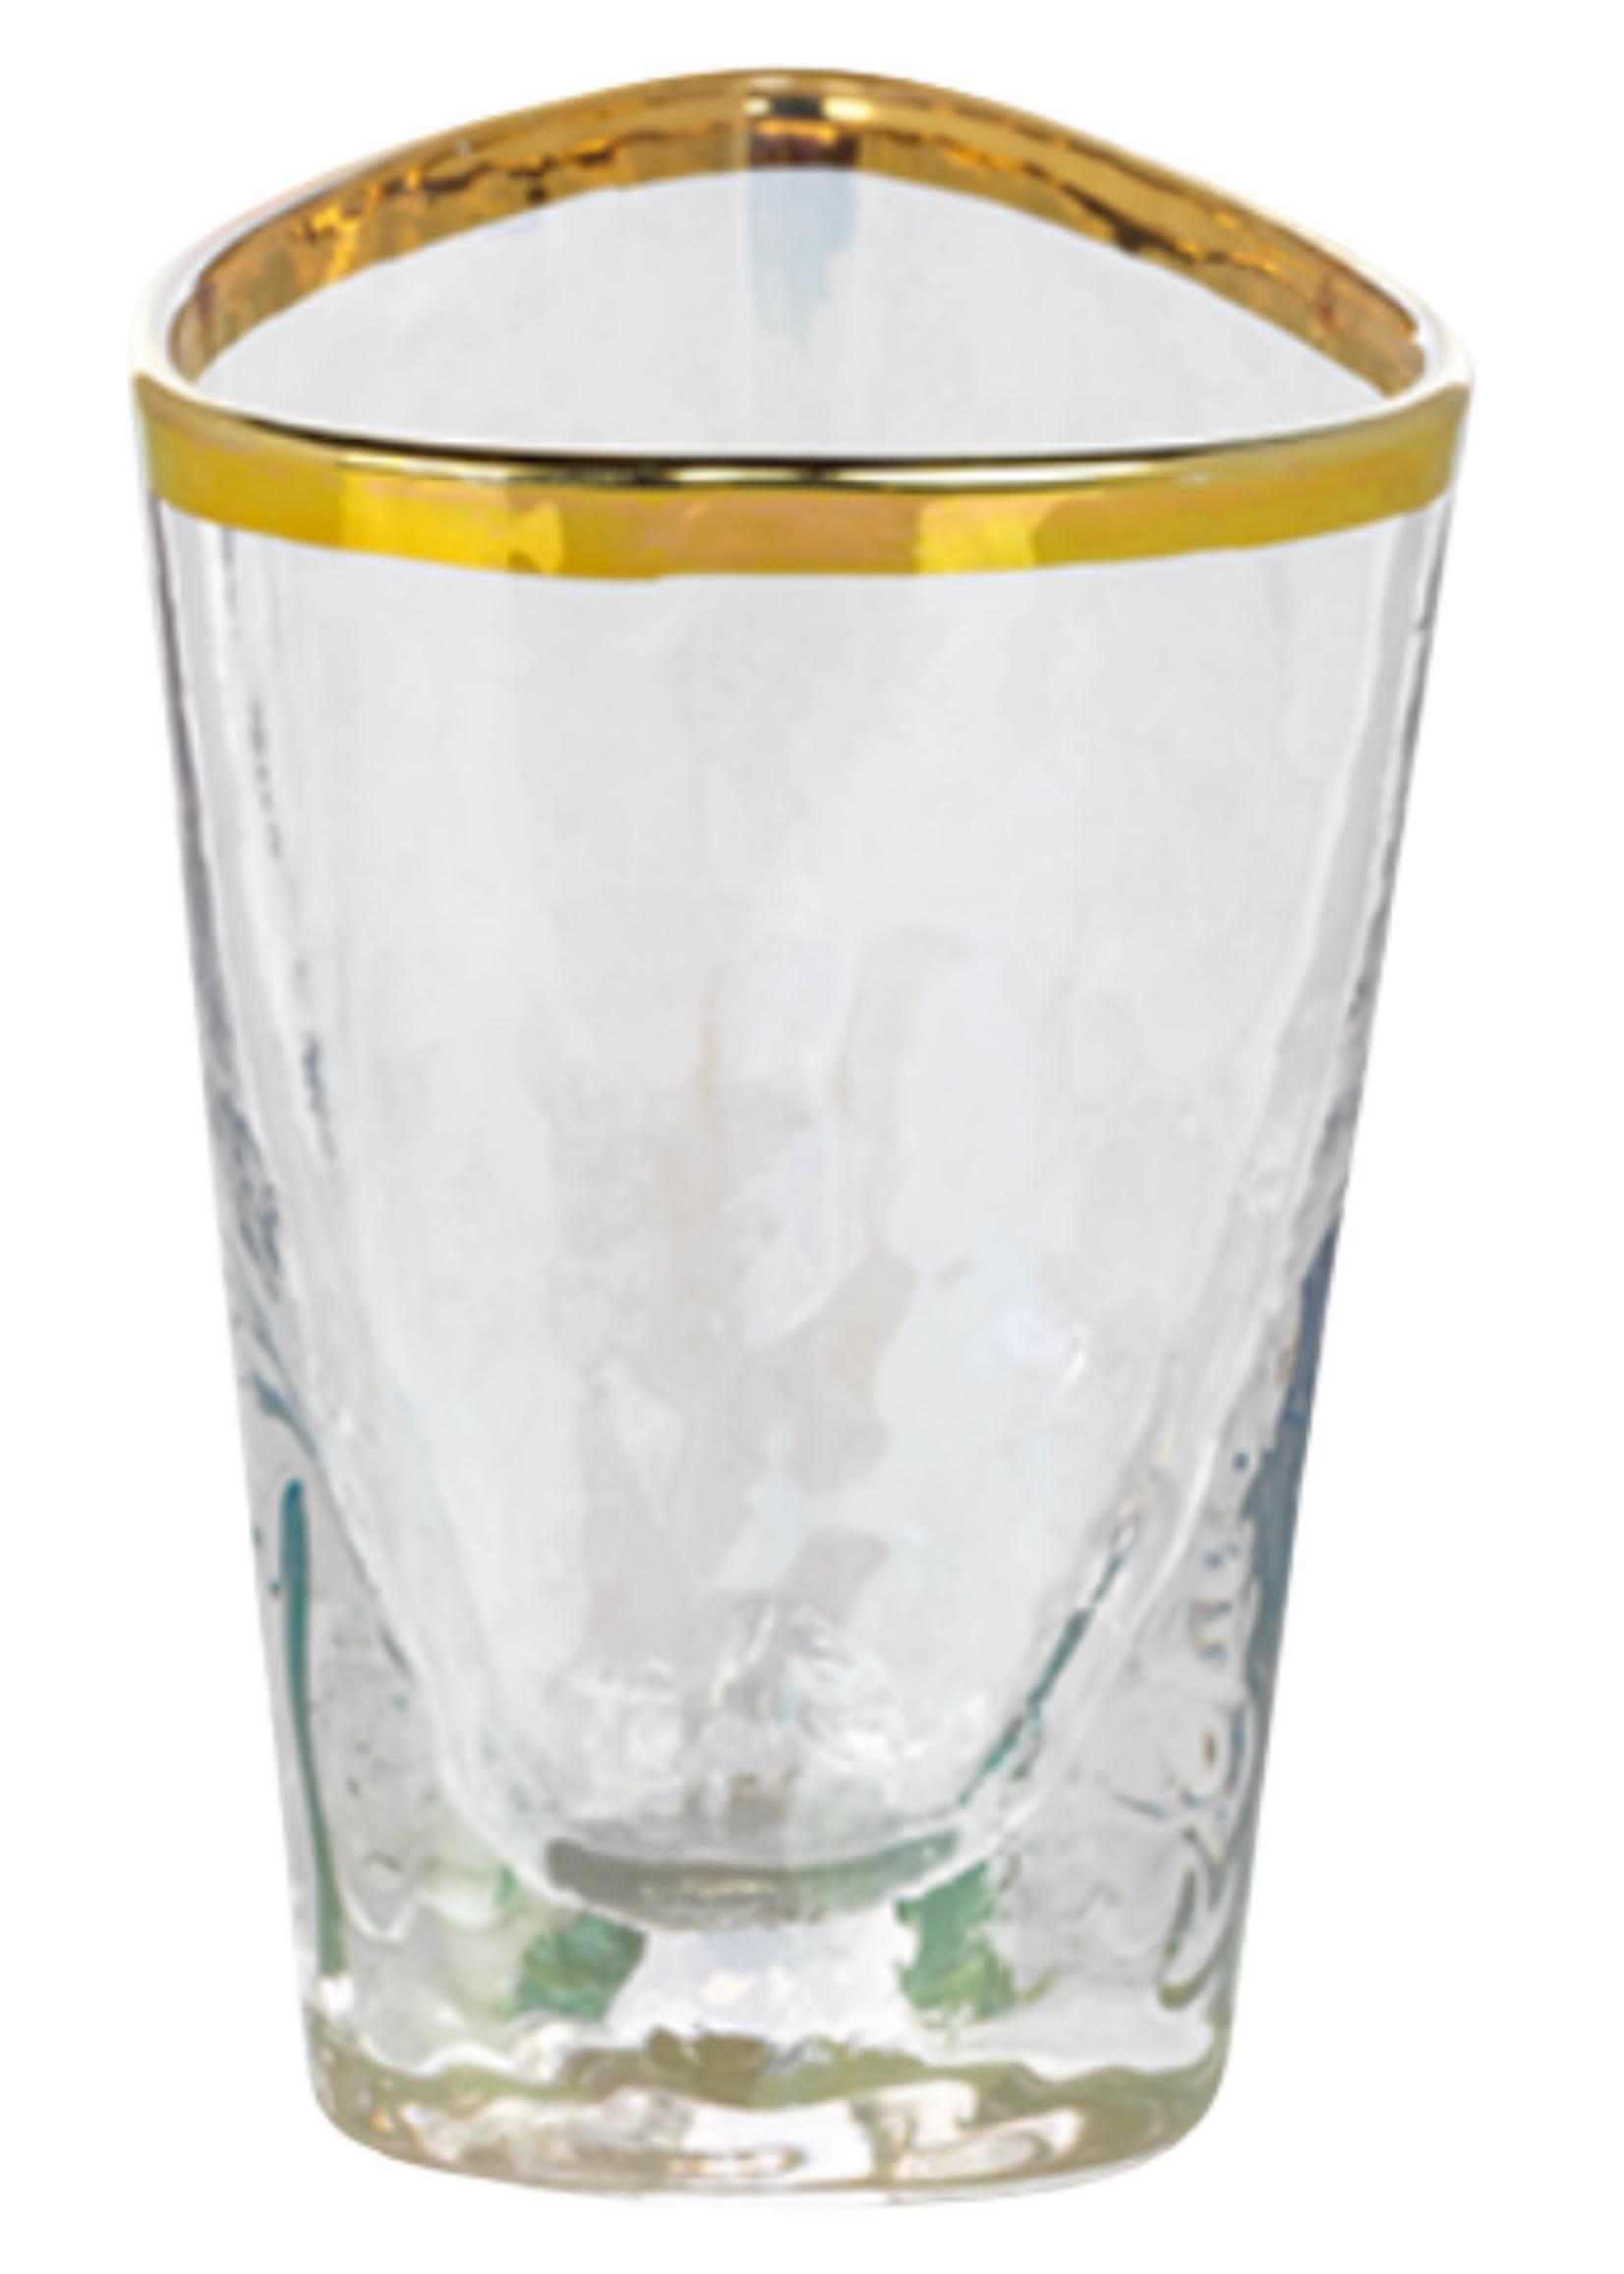 Aperitivo Triangular Shot Glass- Luster w/ Gold Rim